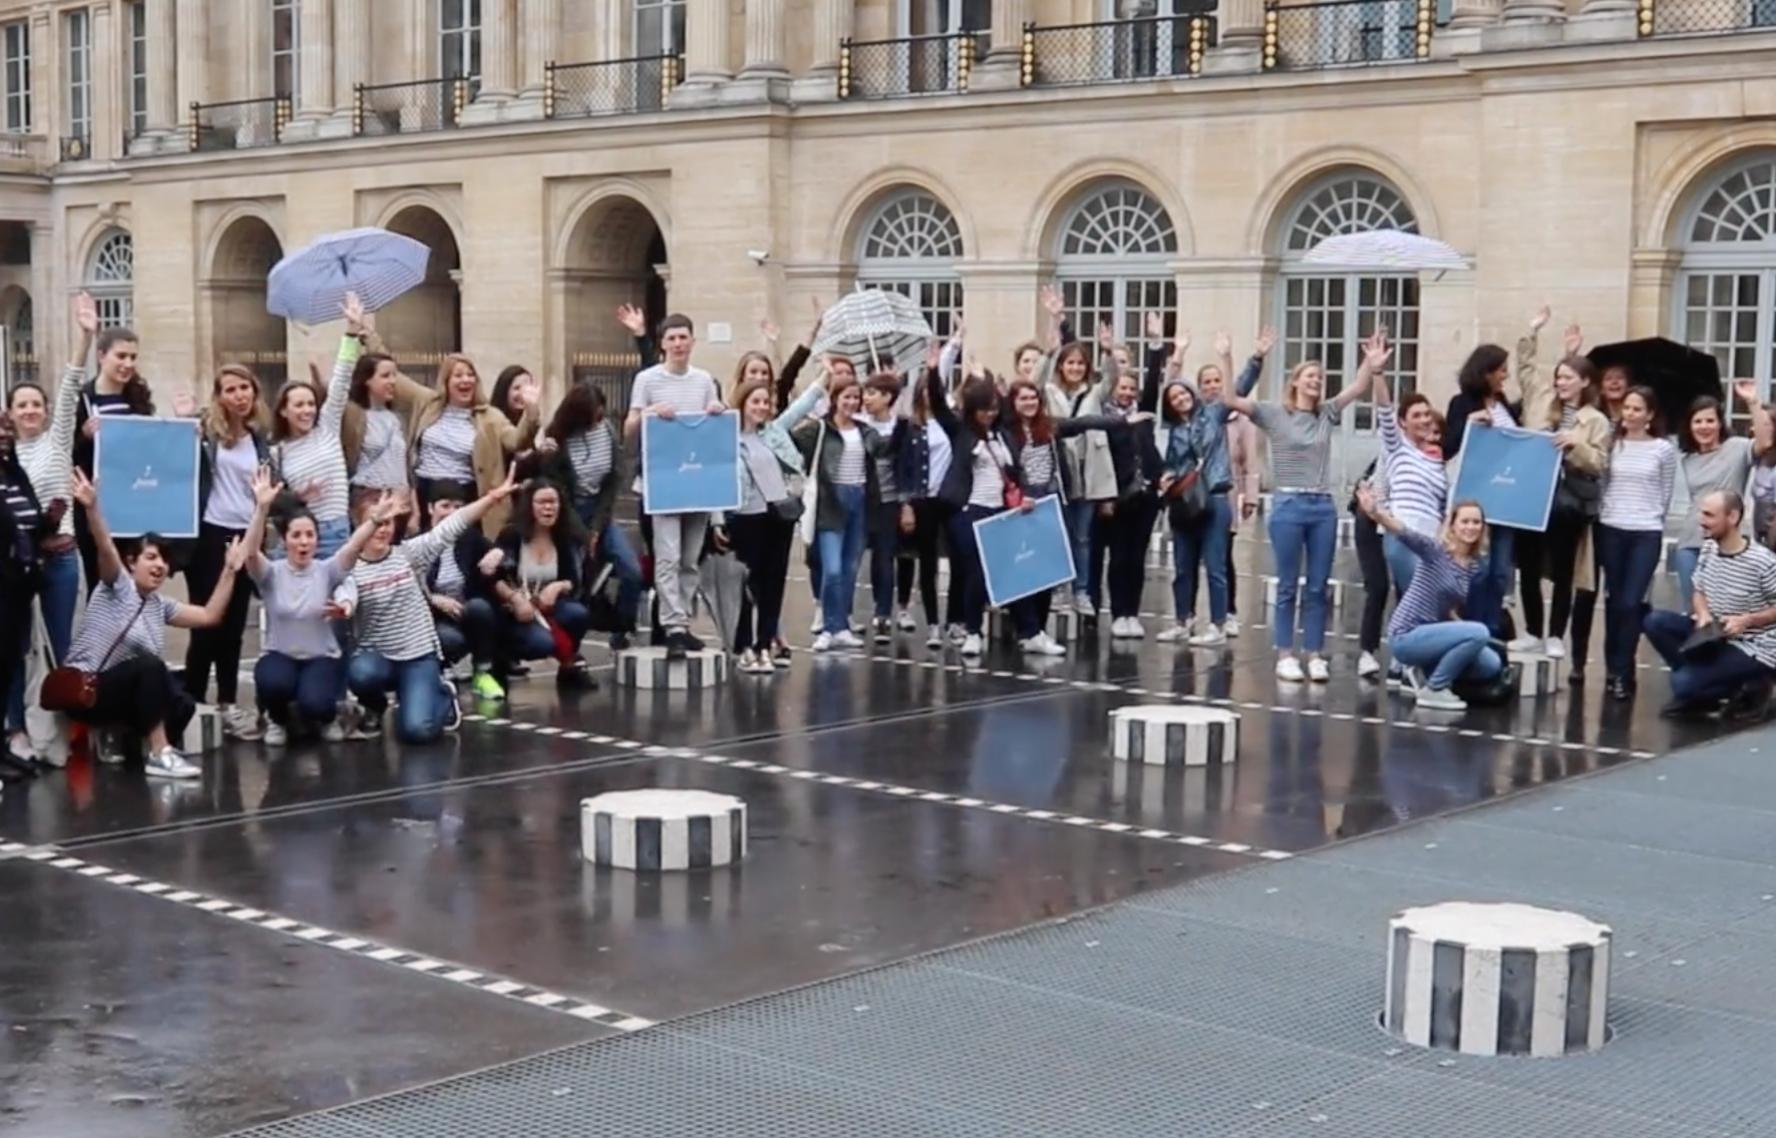 Red de videógrafos profesionales myphotoagency europe informando eventos Jacadi IDKids